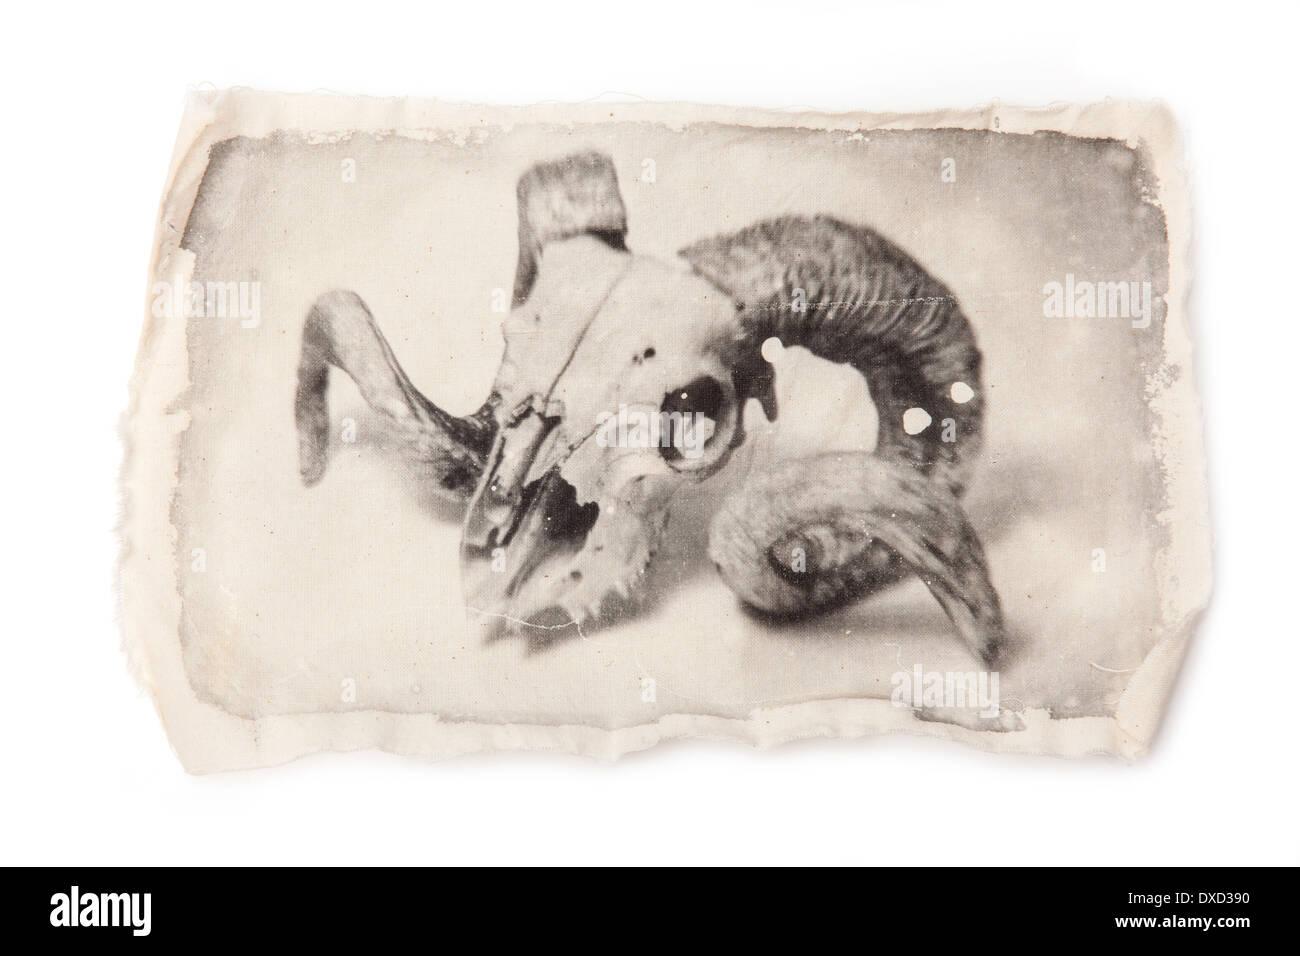 large rams skull liquid emulsion black and white print on cloth. - Stock Image